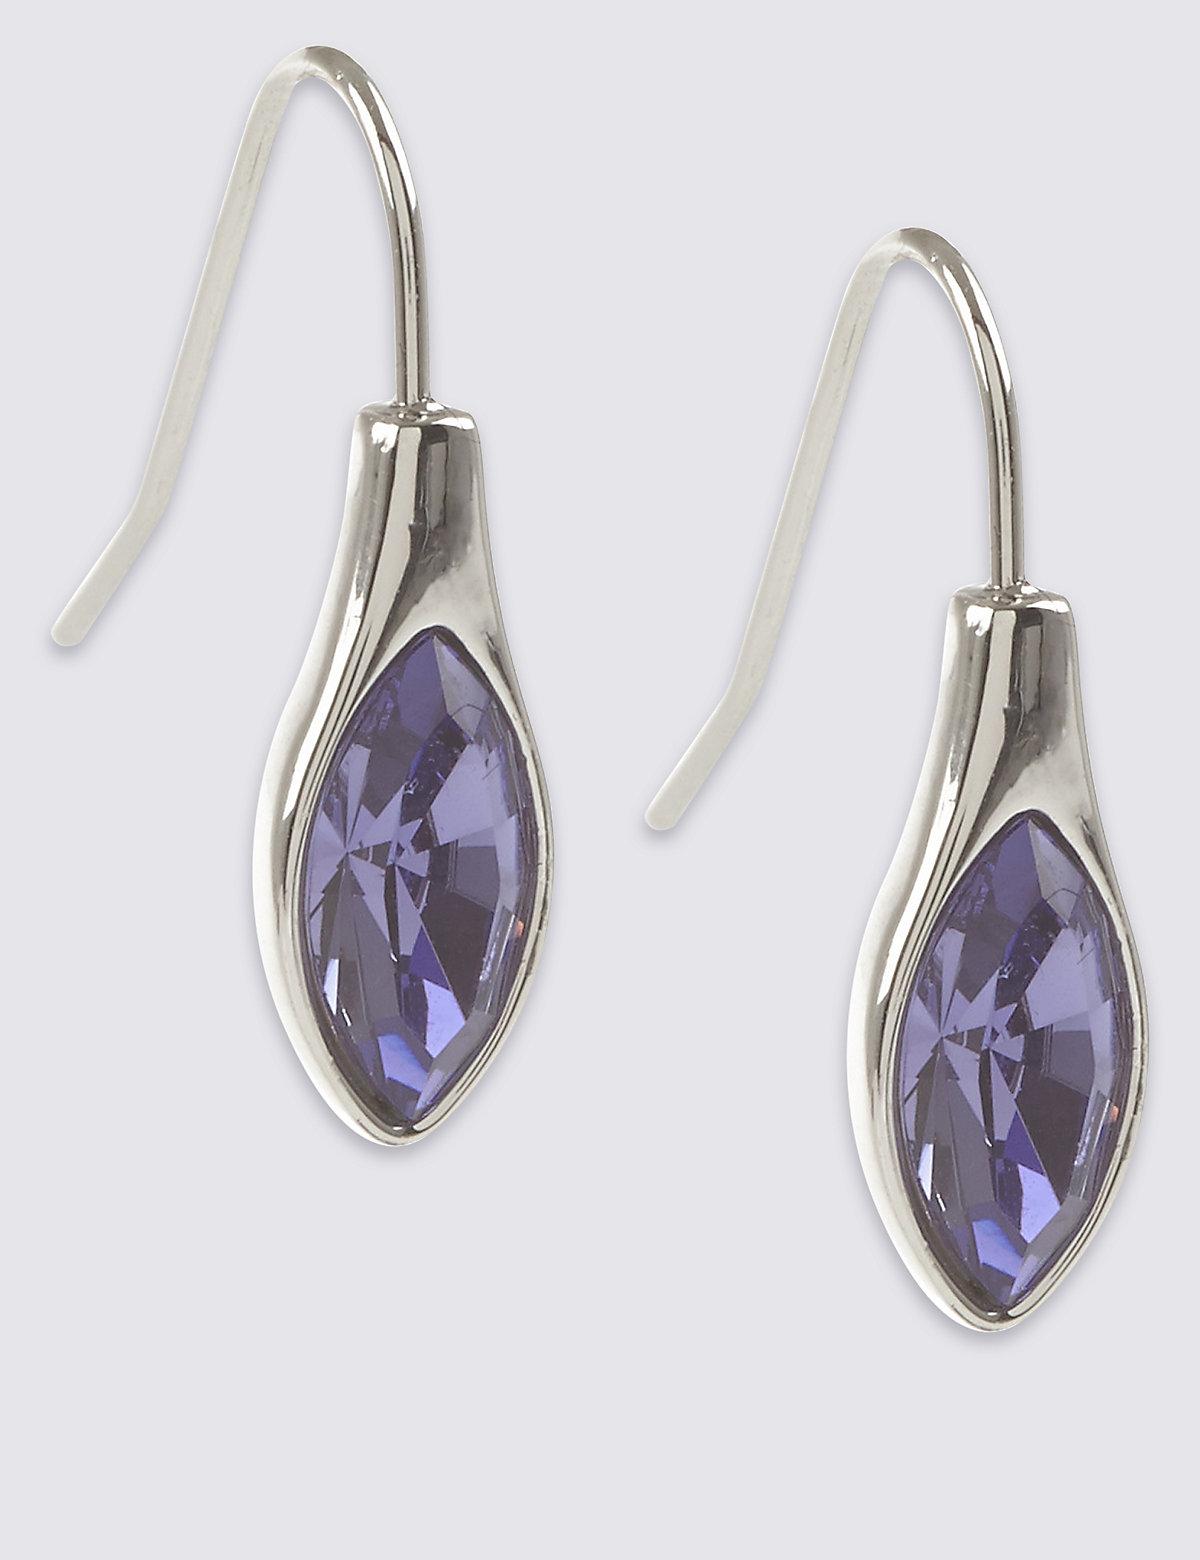 Bridal Jewellery   Wedding Earrings & Necklaces   M&S